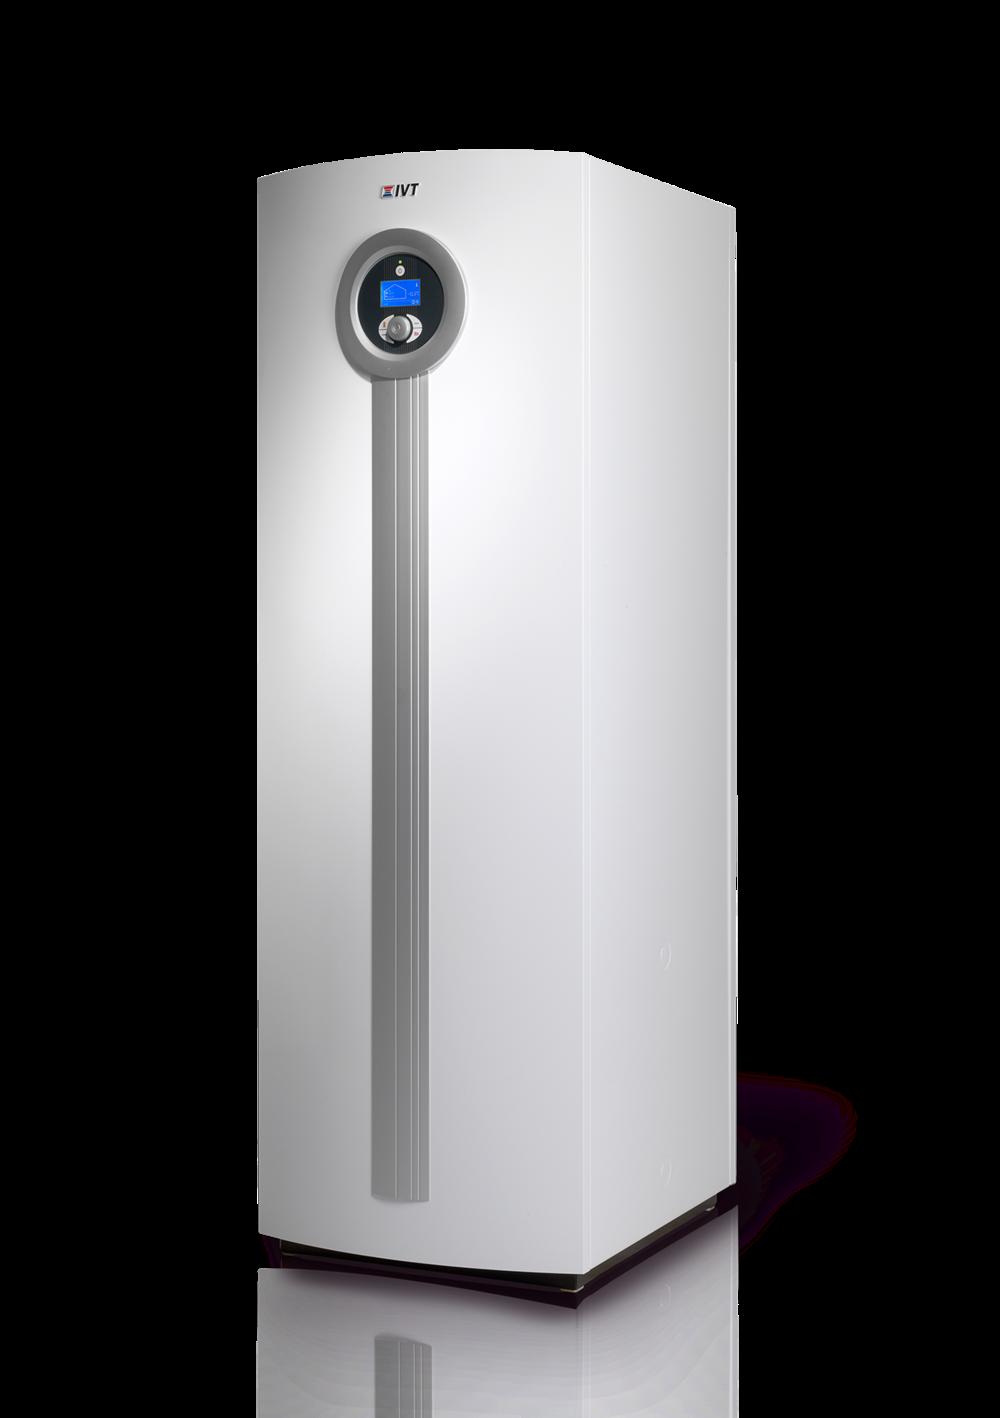 IVT Greenline HE Ground Source Heat Pump